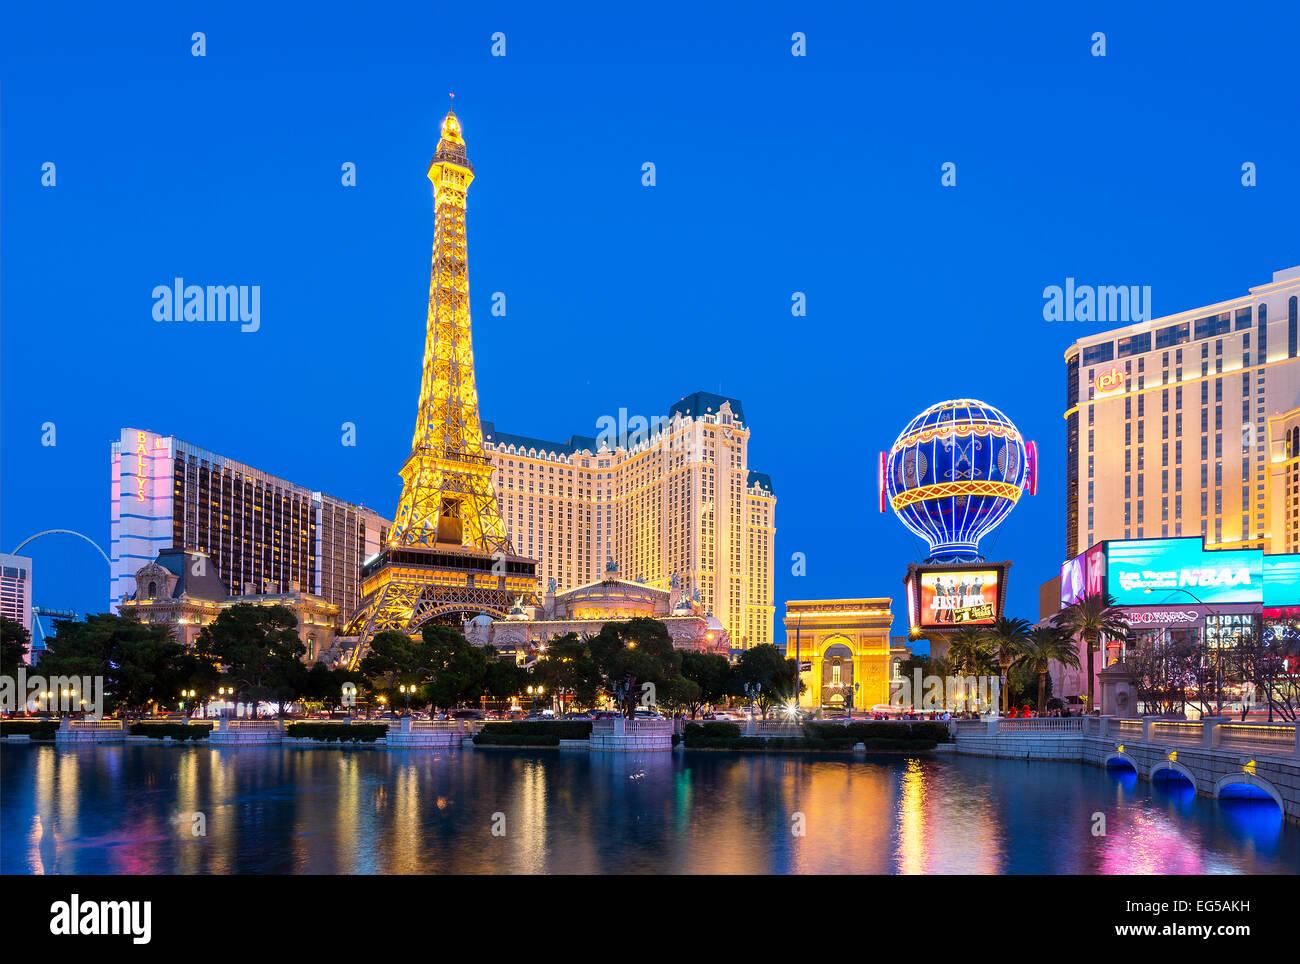 Replica Eiffel tower at Las Vegas - Stock Image